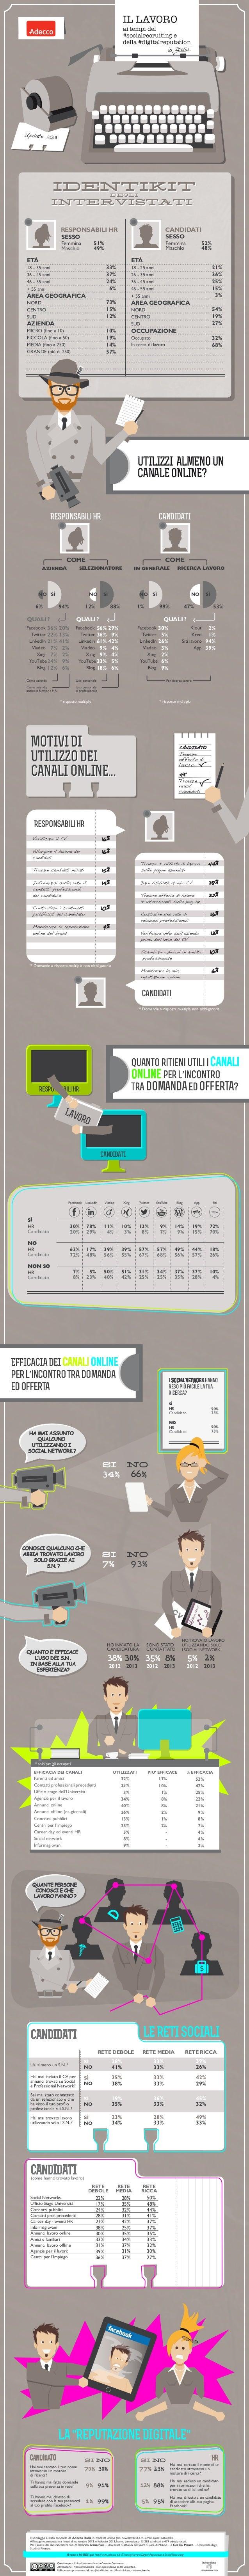 digital reputation e social recruiting indagine adecco 2013